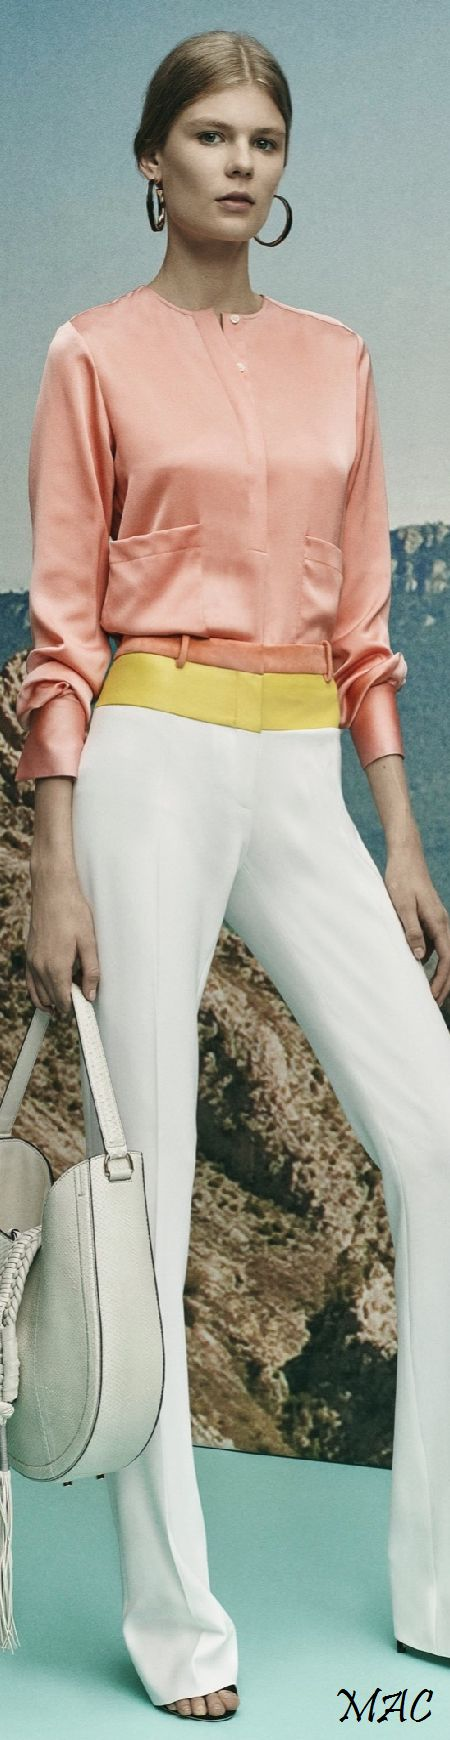 Altuzarra Resort 16: coral satin shirt, white pants with color-blocked.